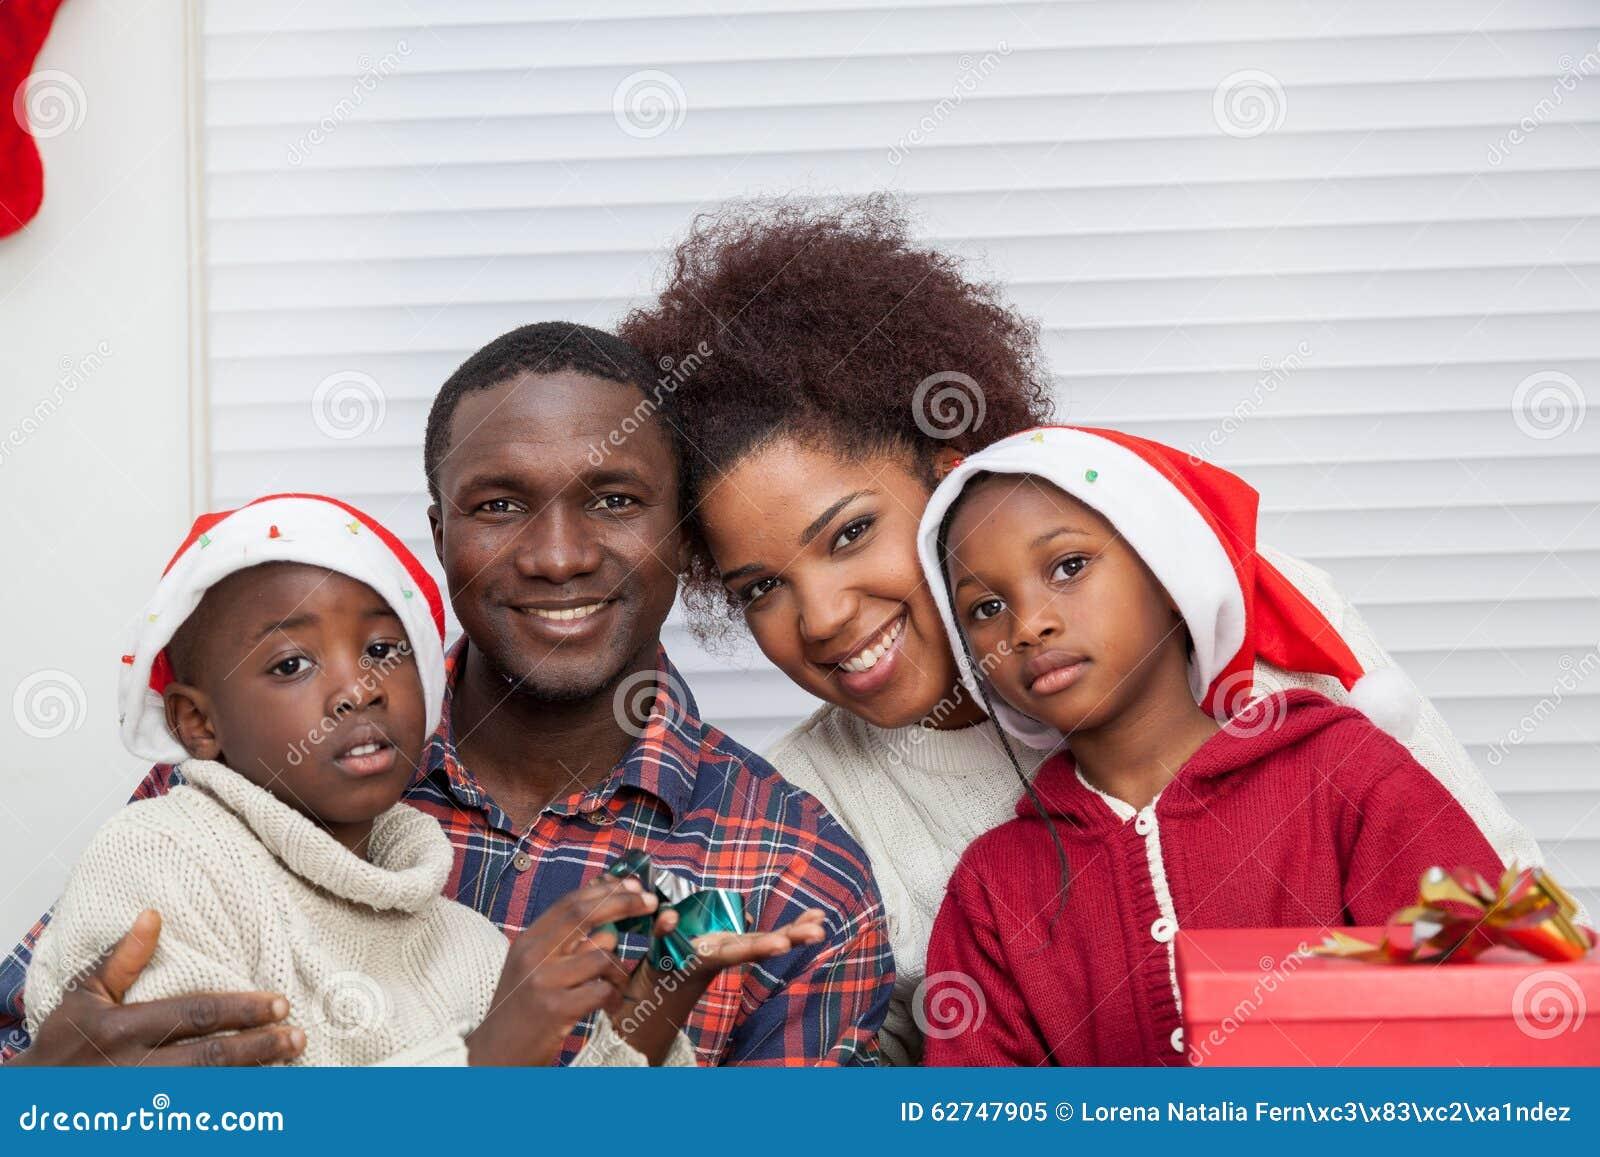 Portrait of black family